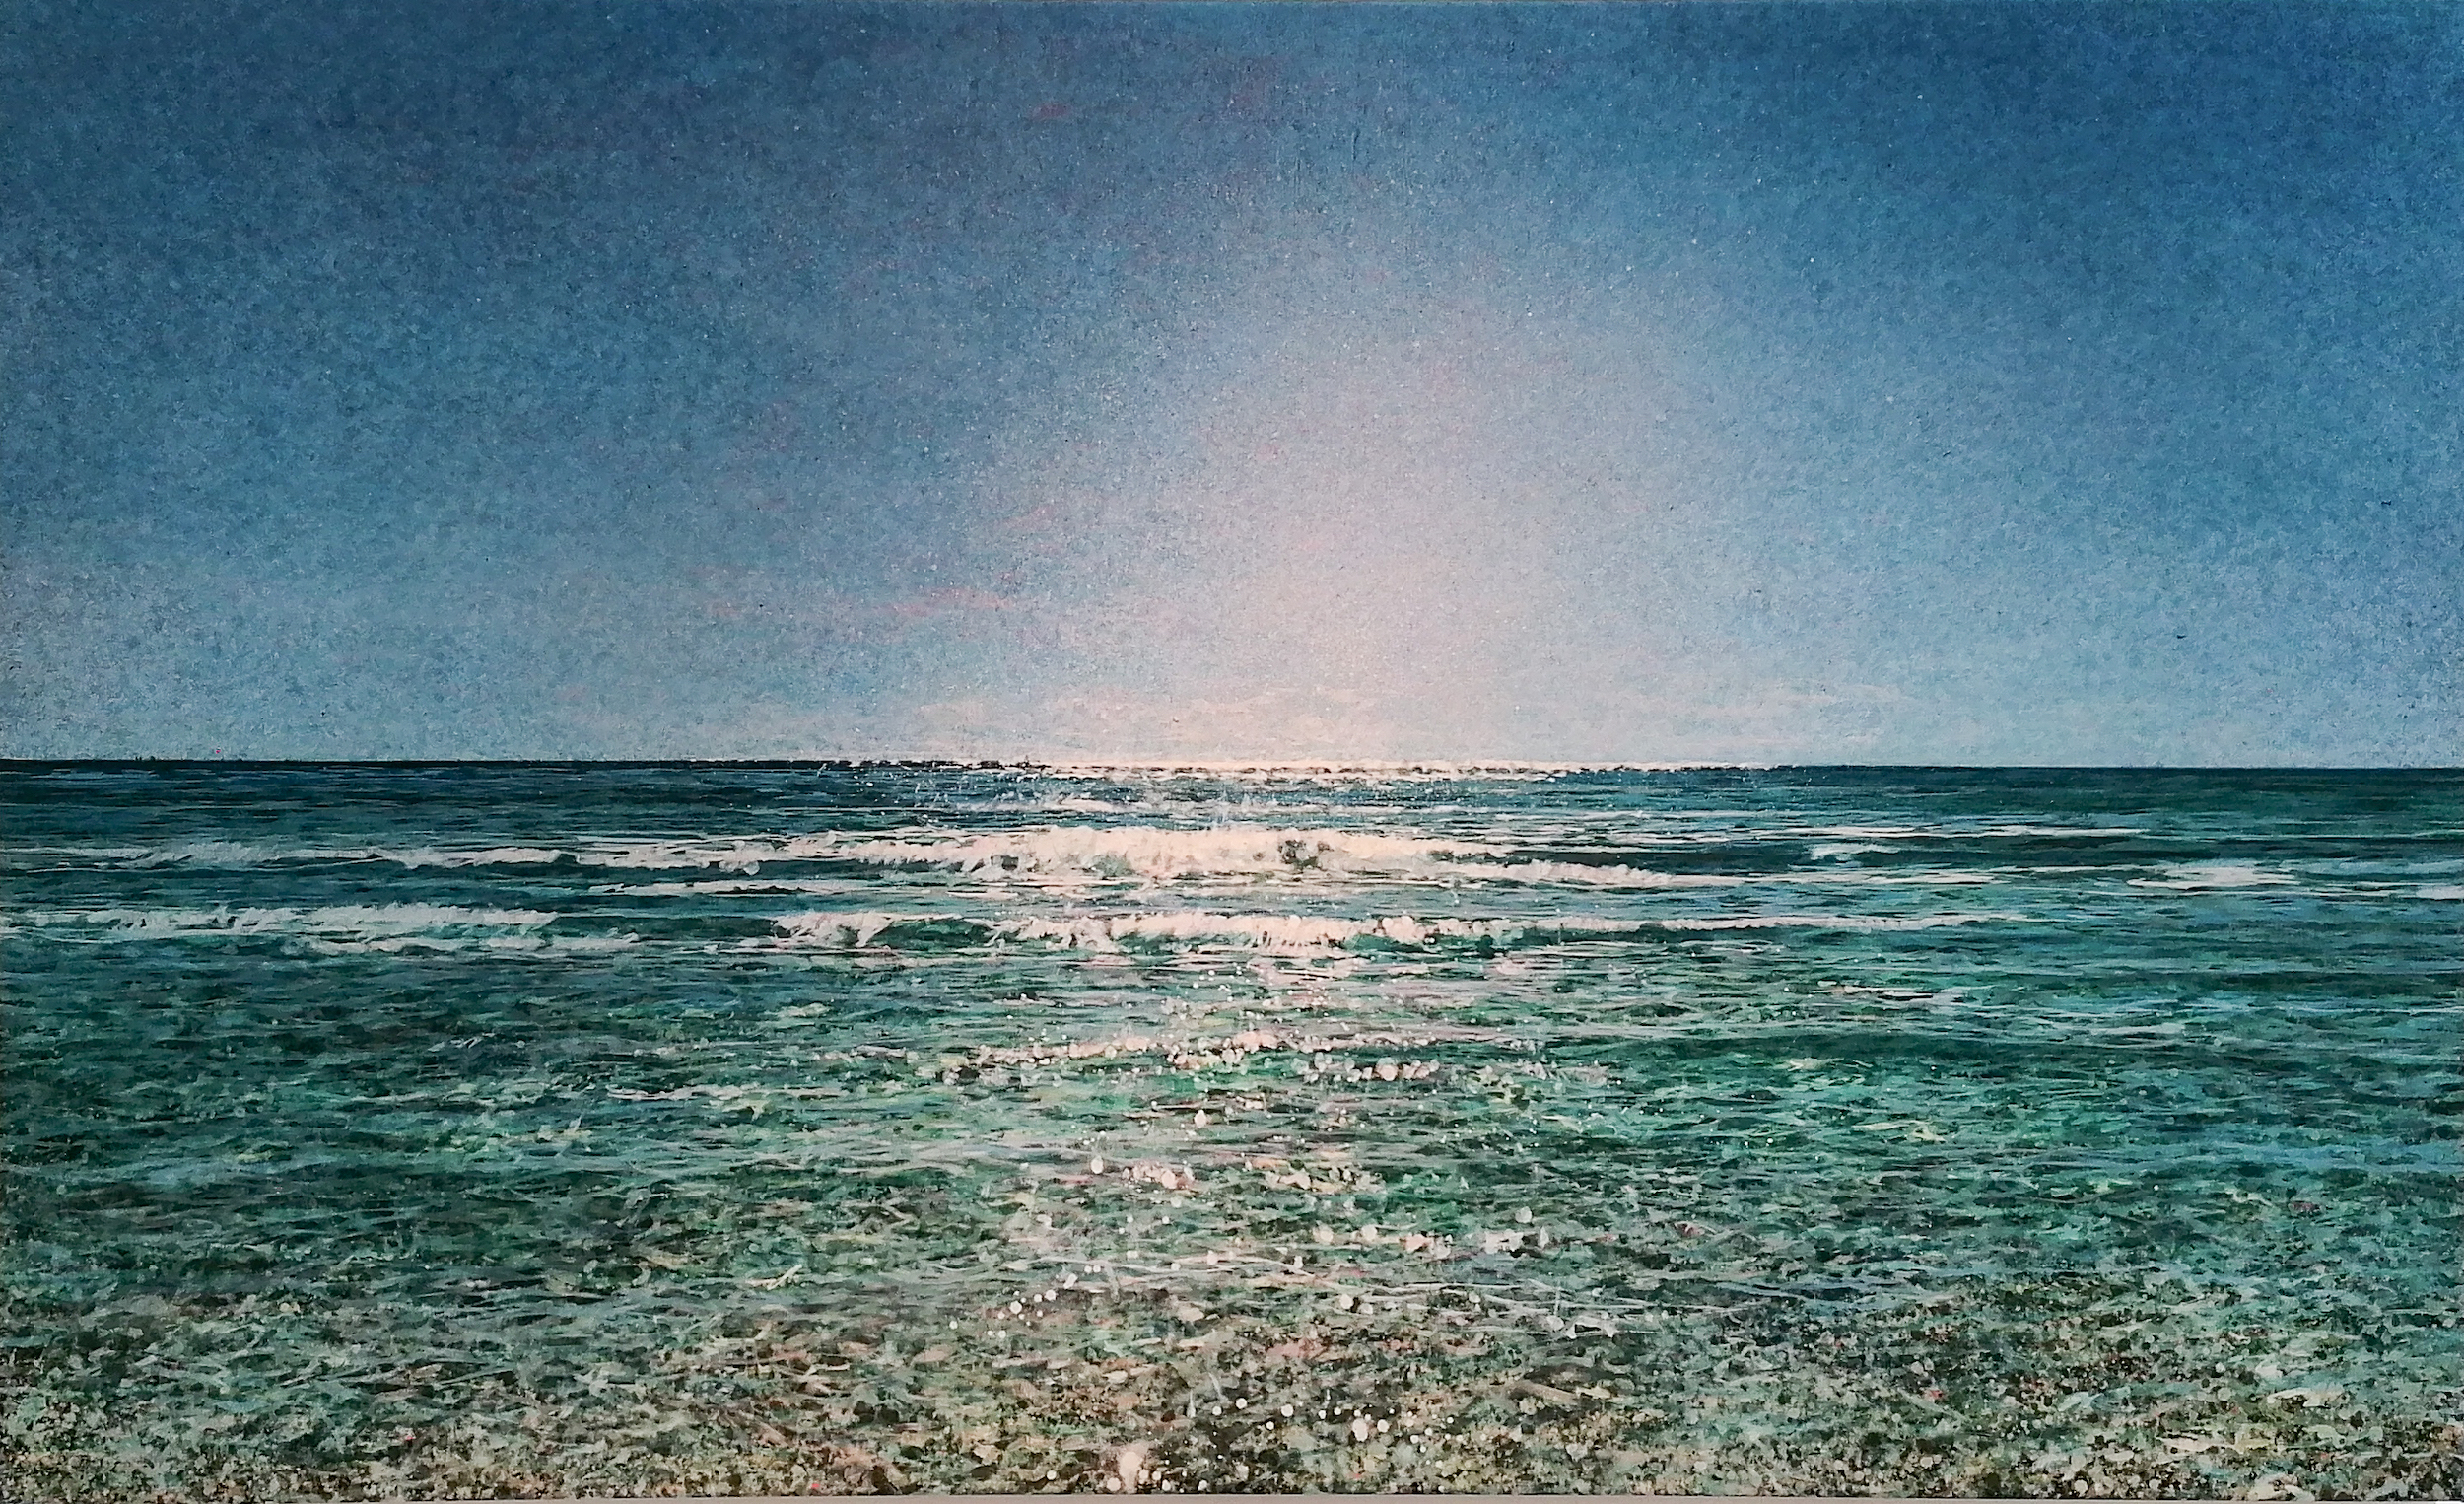 Robert Arató: Seascape 1, Druck auf Leinwand, gefirnisst, 140 x 85 cm, 980 Eur